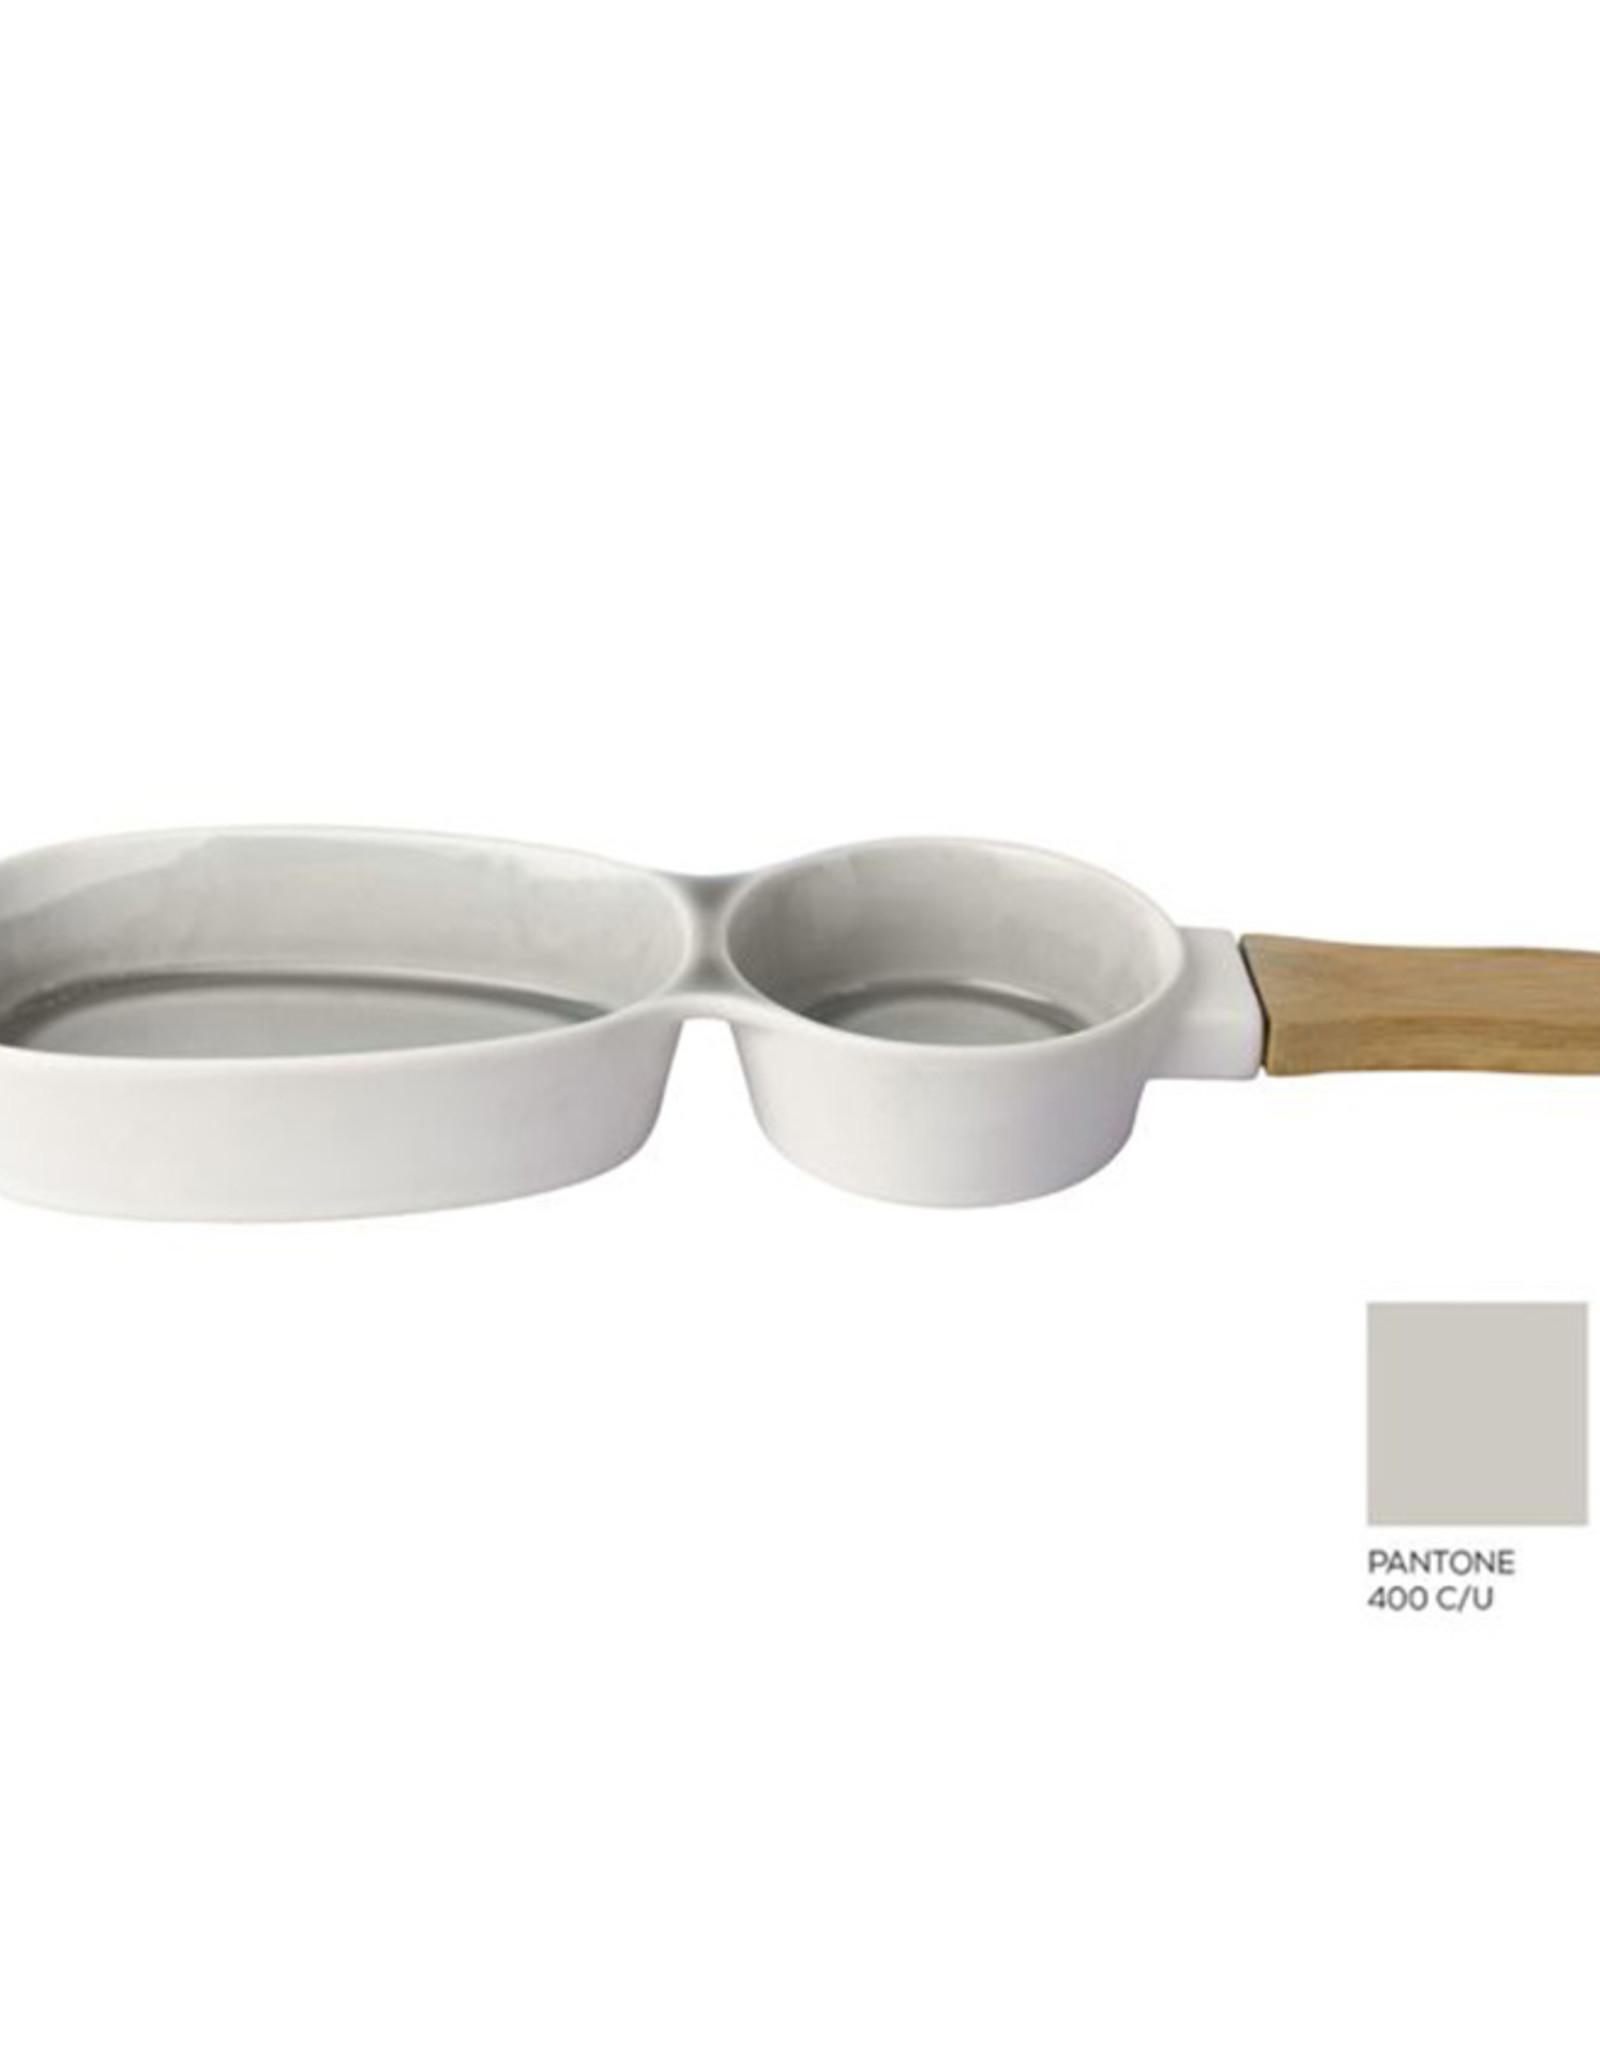 Serveerplateau Duo 36x10cm-grey ceramic/wood